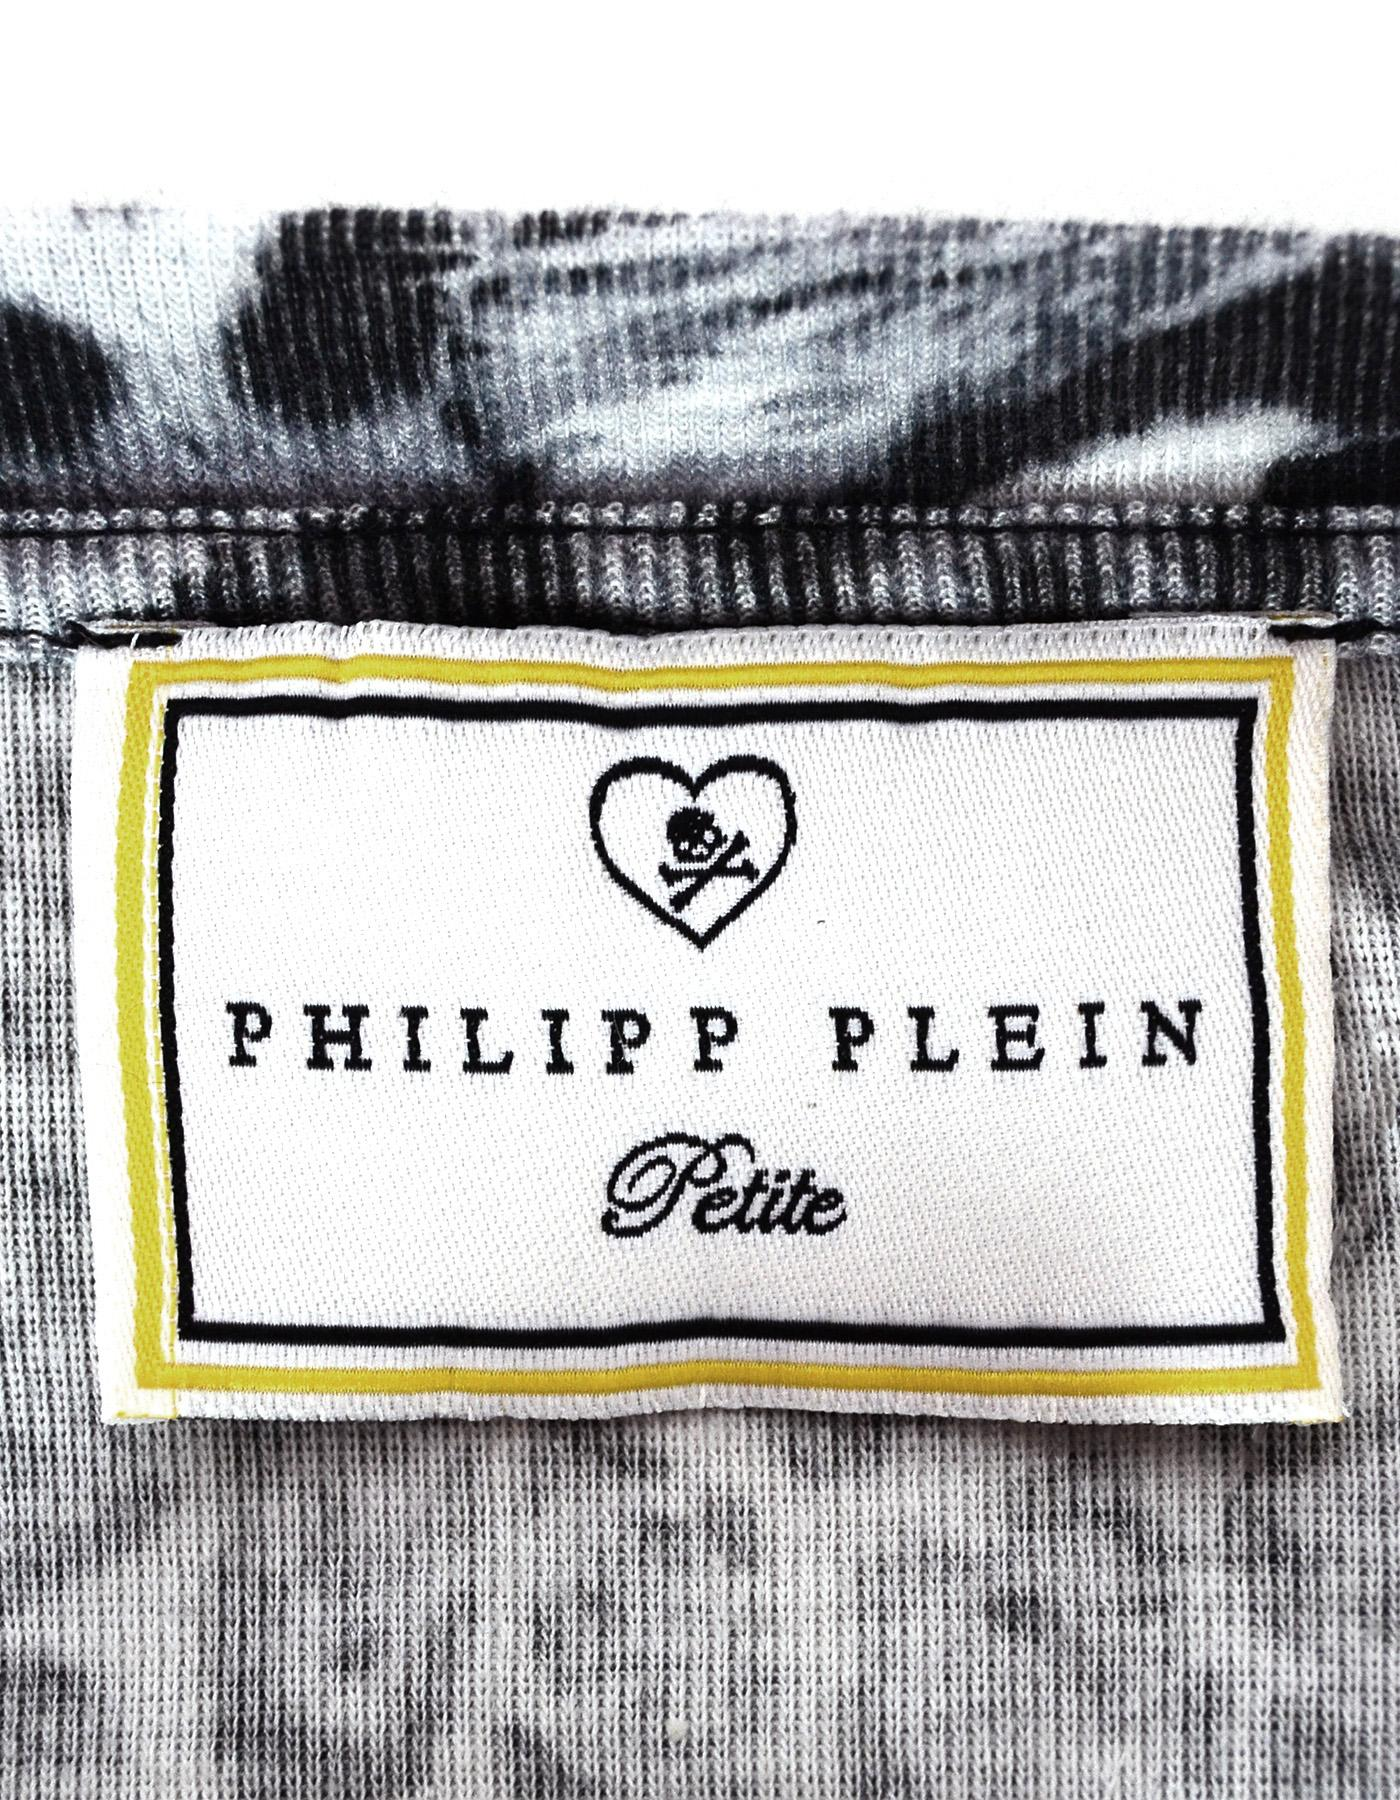 Sale.. Rare Philipp Plein Cardigan JacketBig Print logoRare designSize on tag Medium.